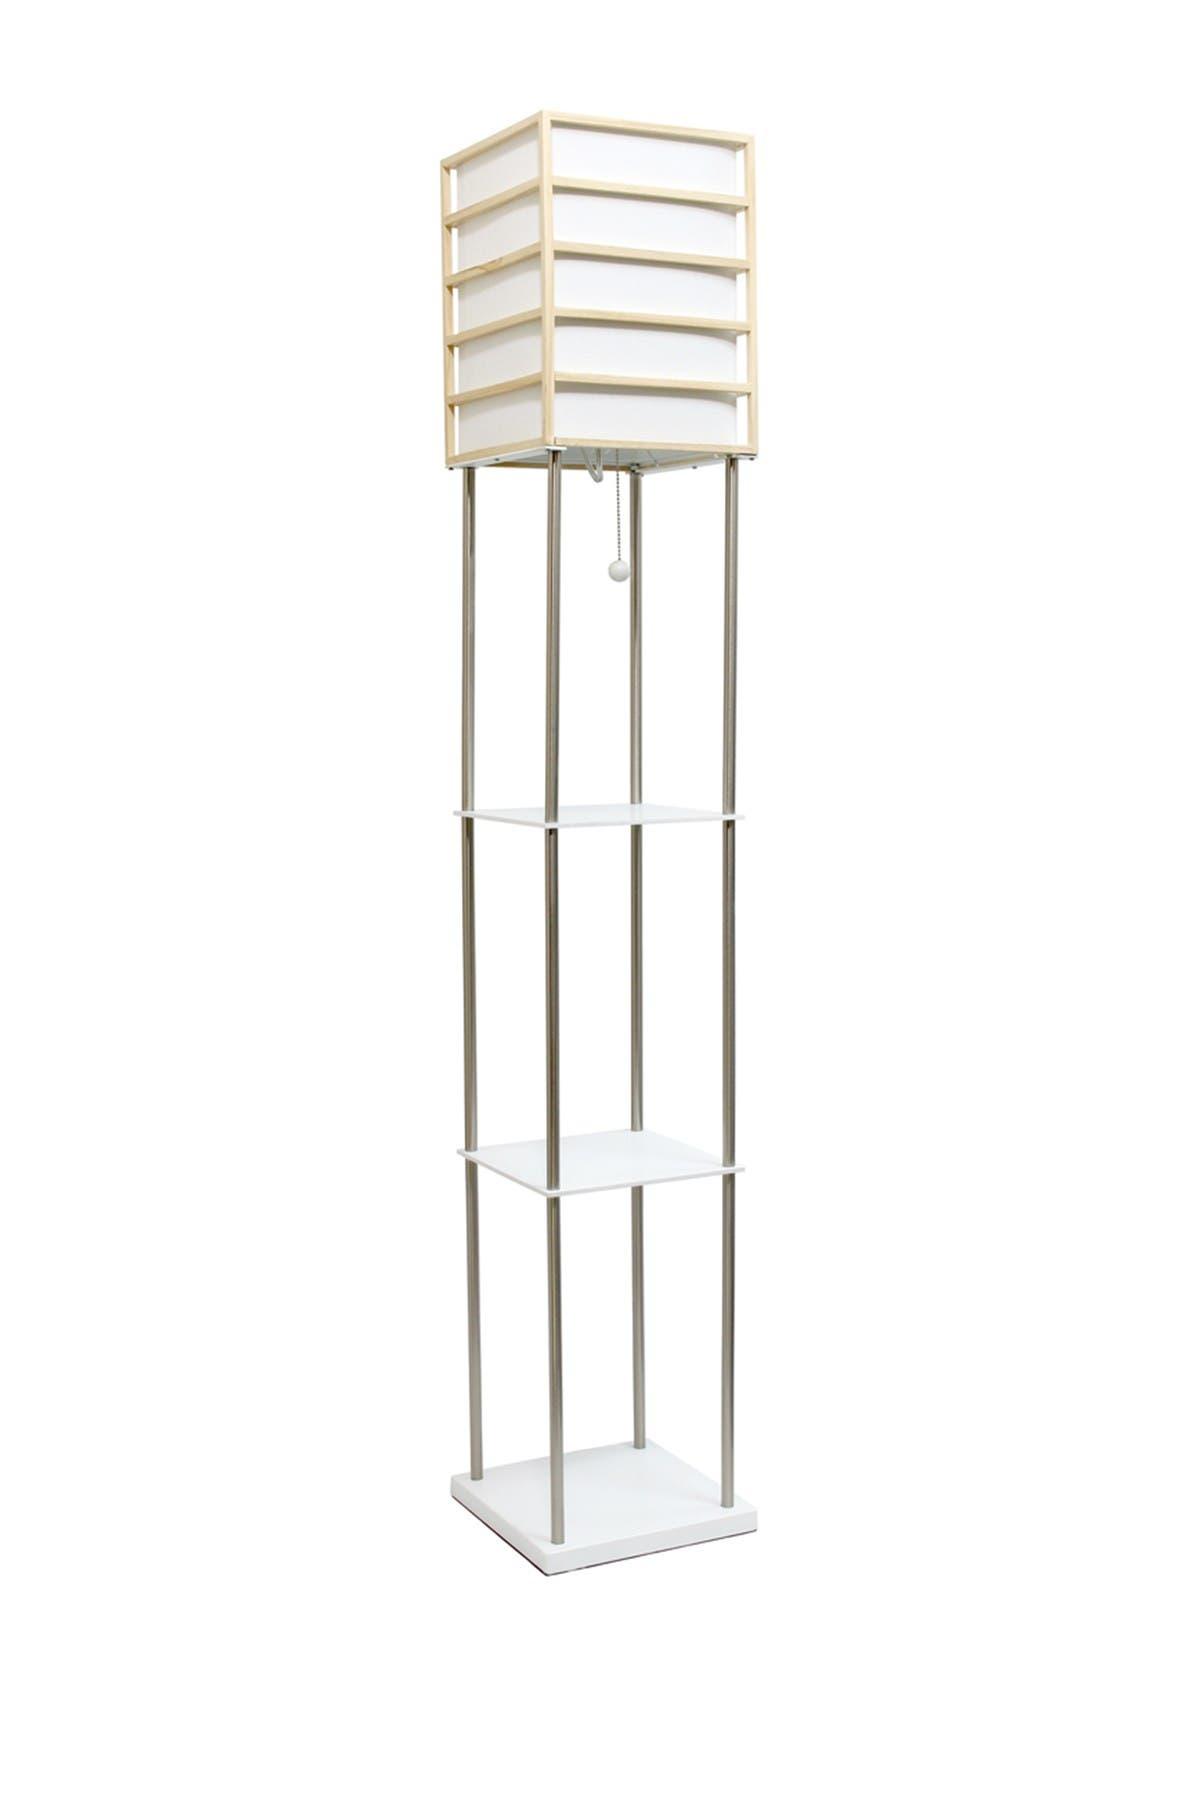 Lalia Home Light Metal Etagere Floor Lamp With Storage Shelves Linen Shade Wood Nordstrom Rack